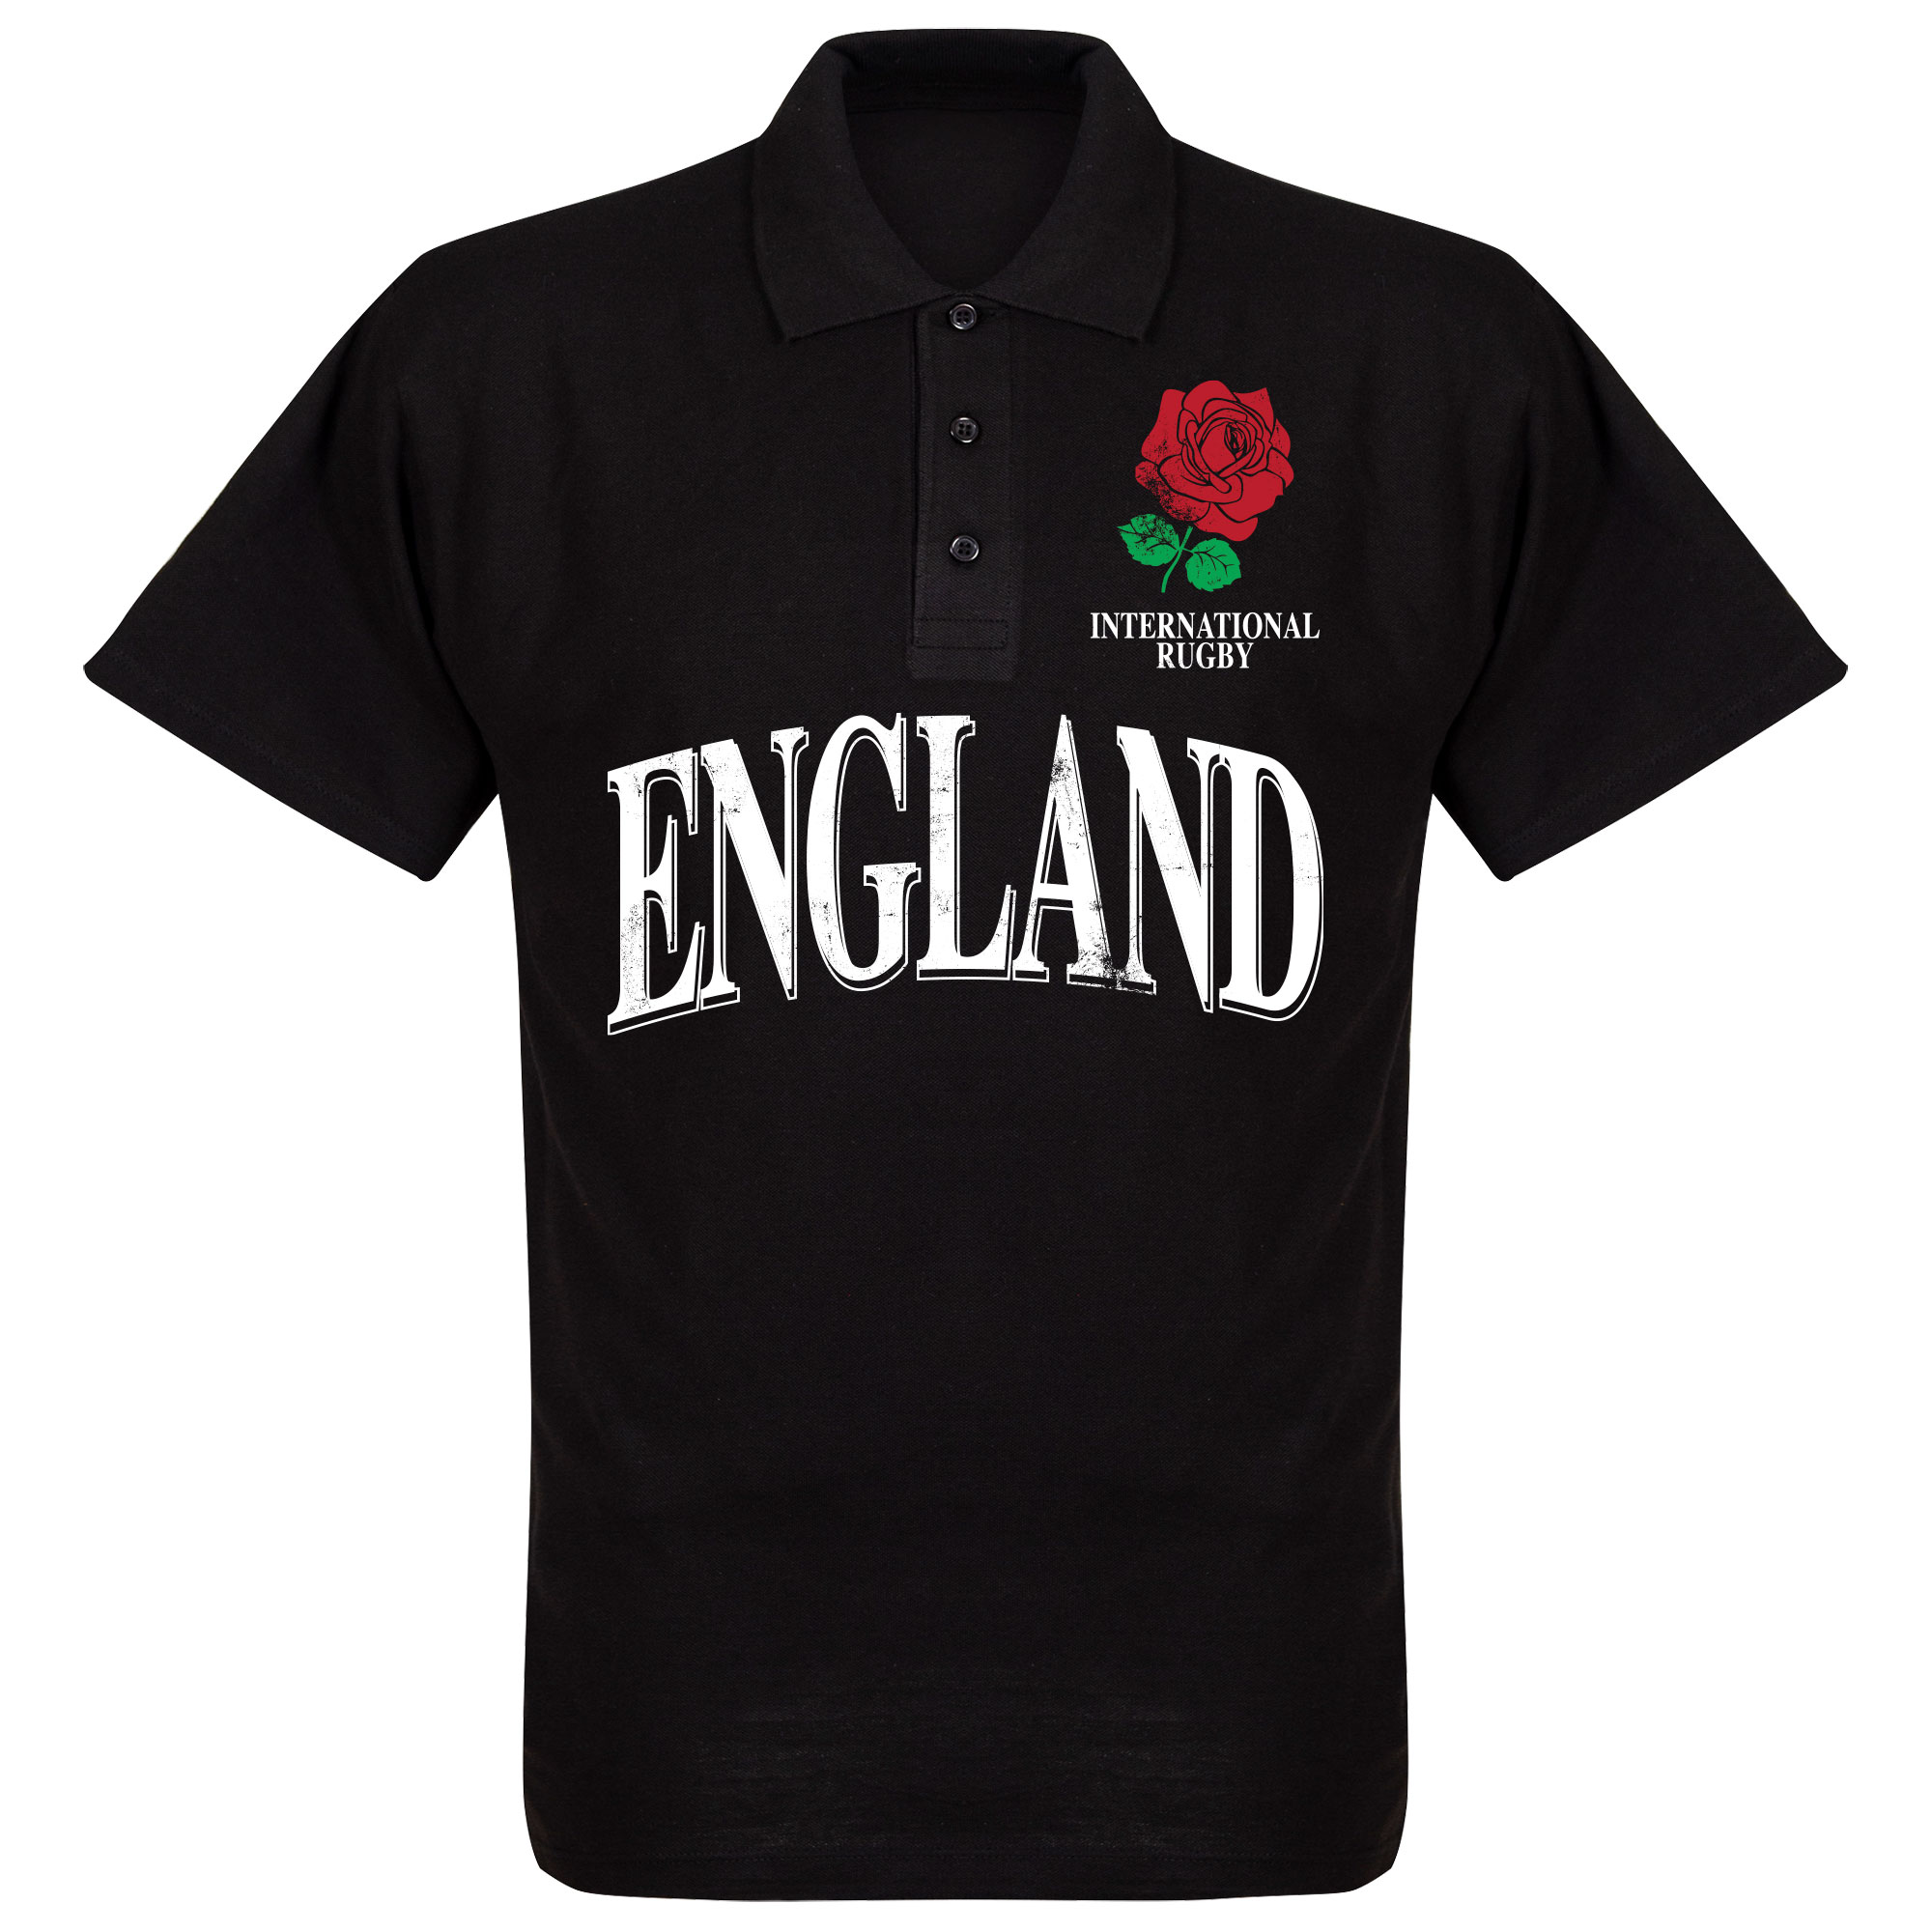 Engeland Rose International Rugby Polo Shirt - Zwart - L